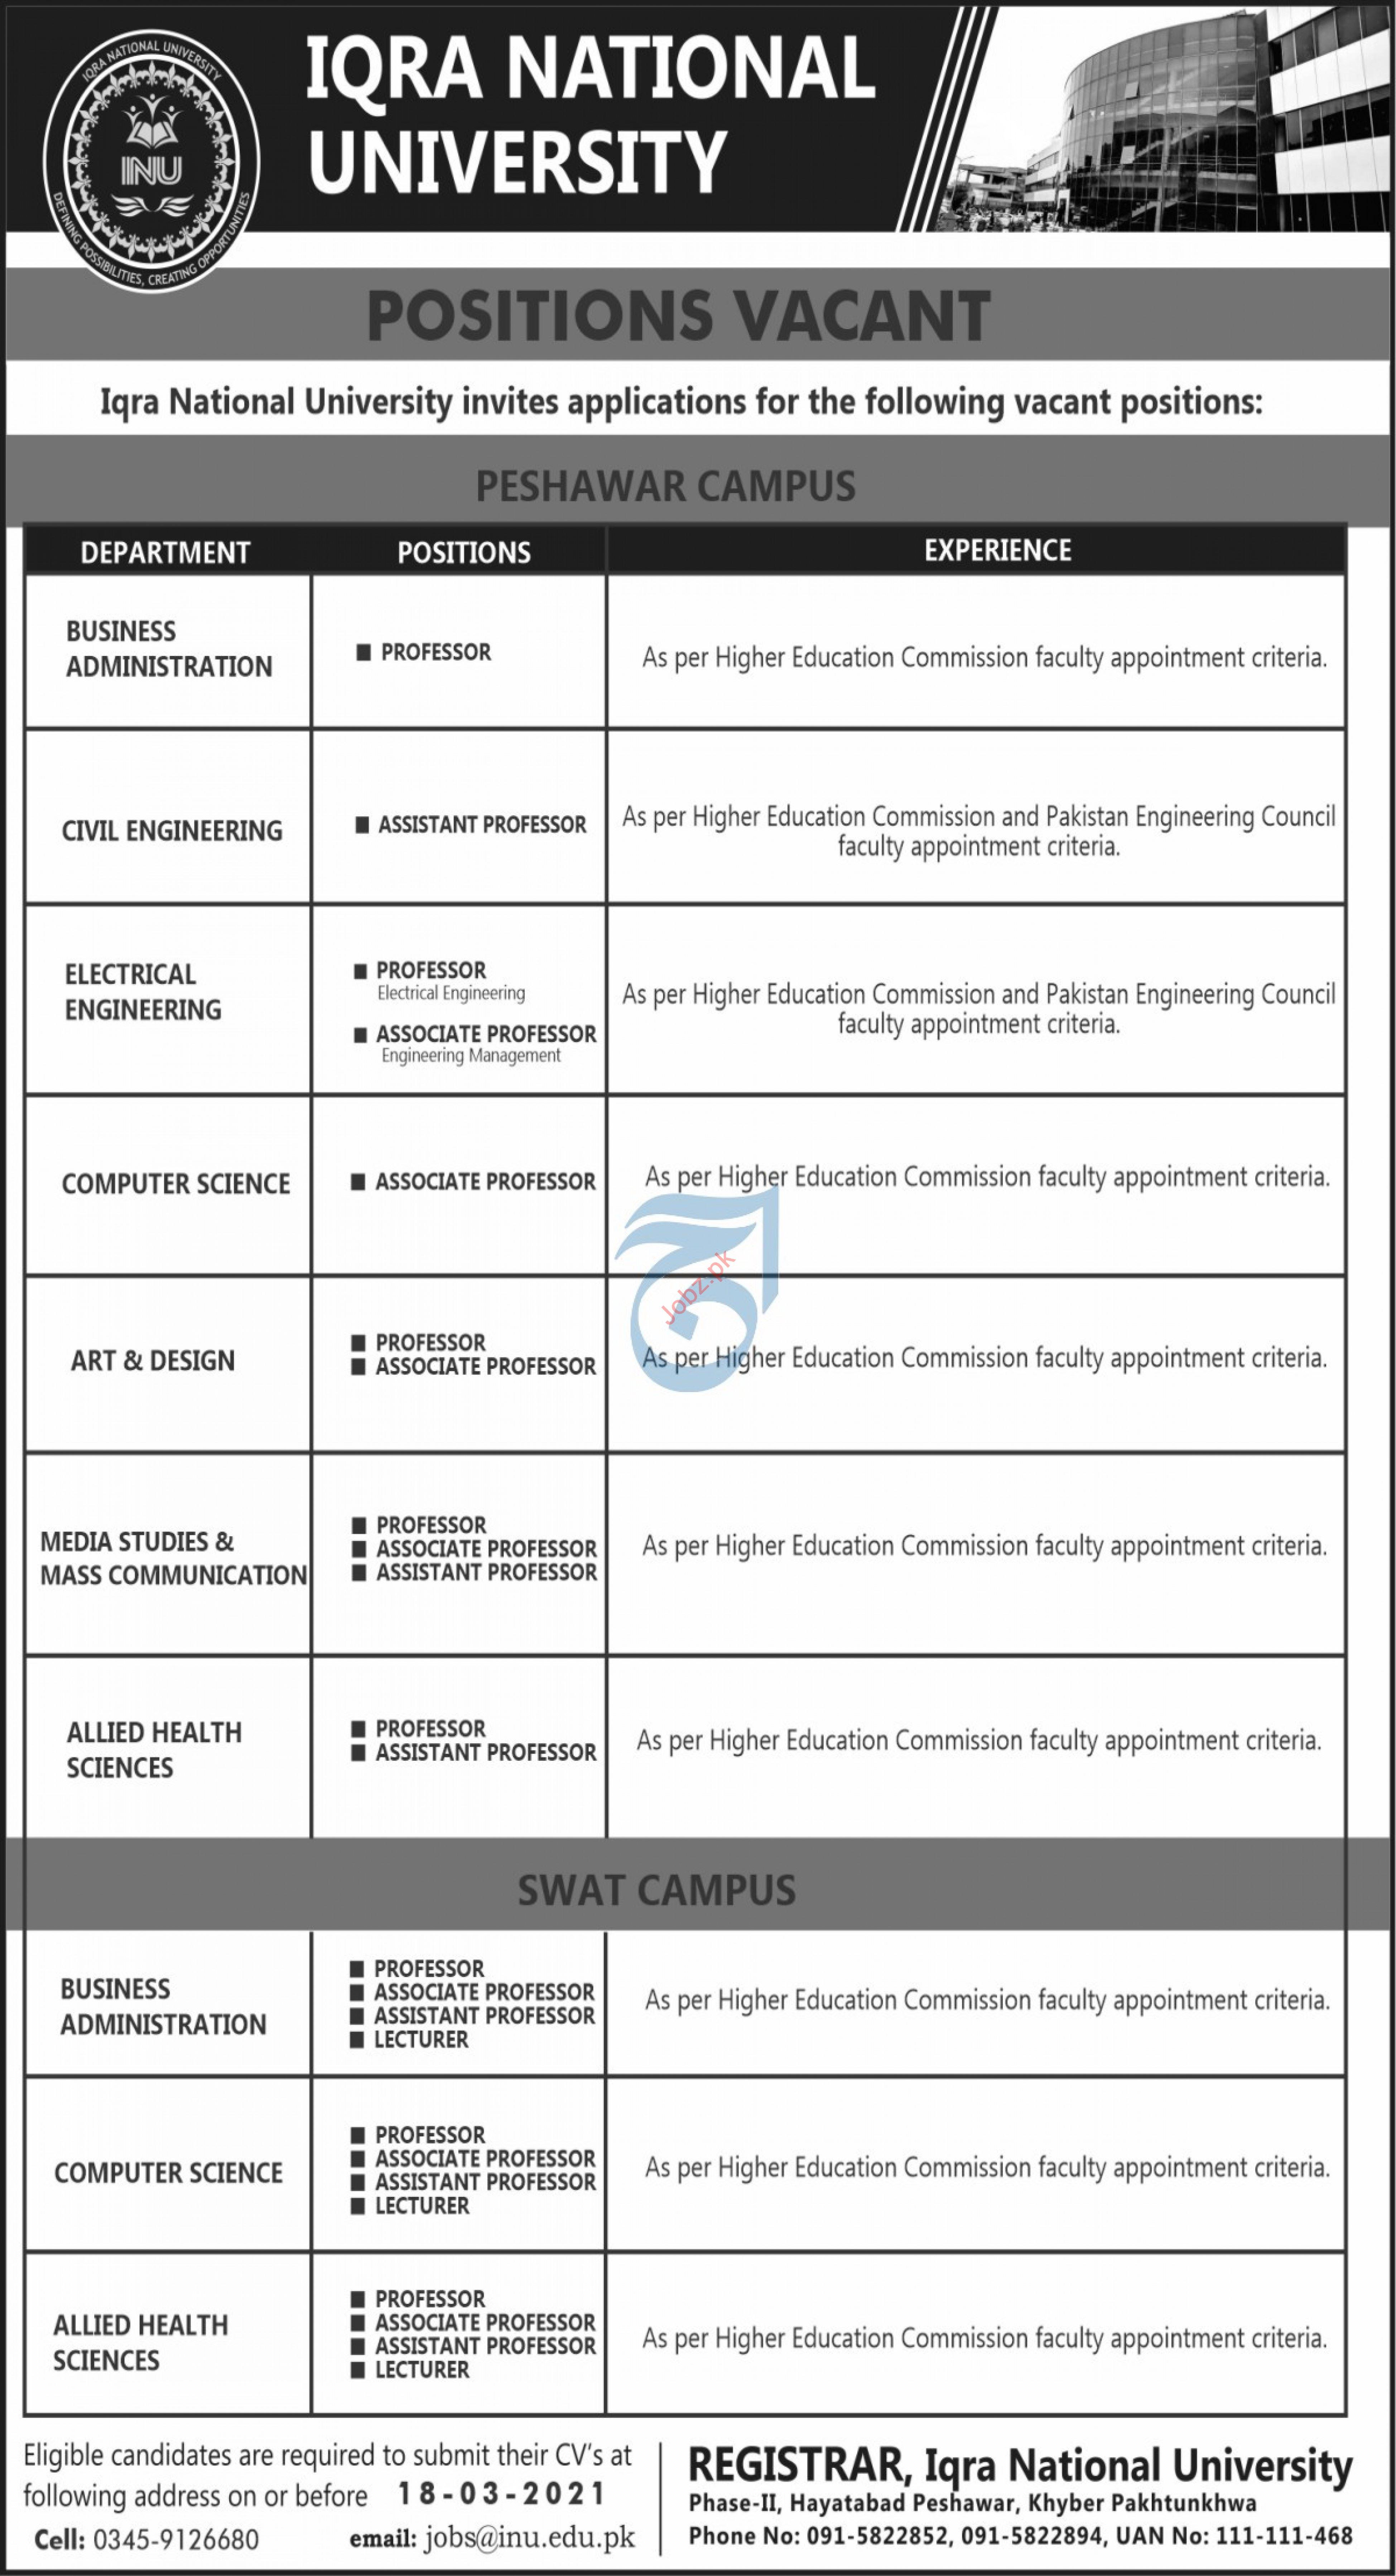 Iqra National University Peshawar Jobs 2021 for Professors